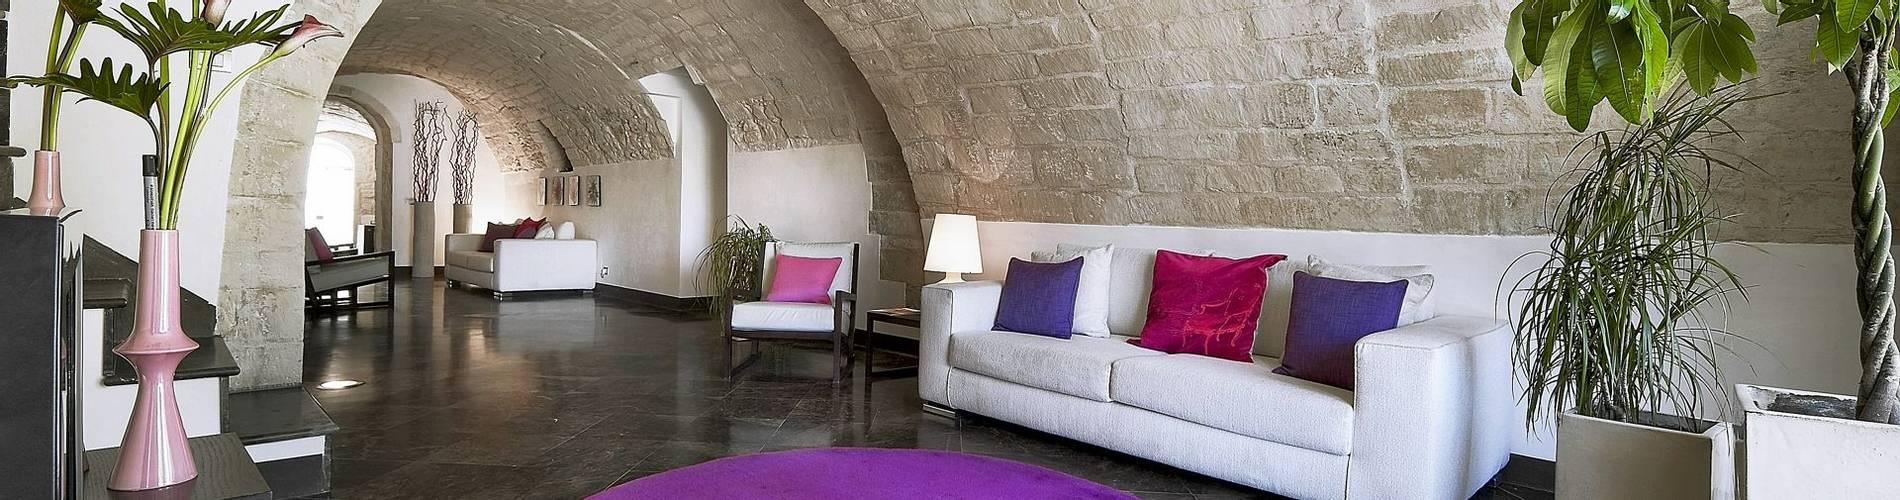 Villa Del Lauro, Sicily, Italy (11).jpg